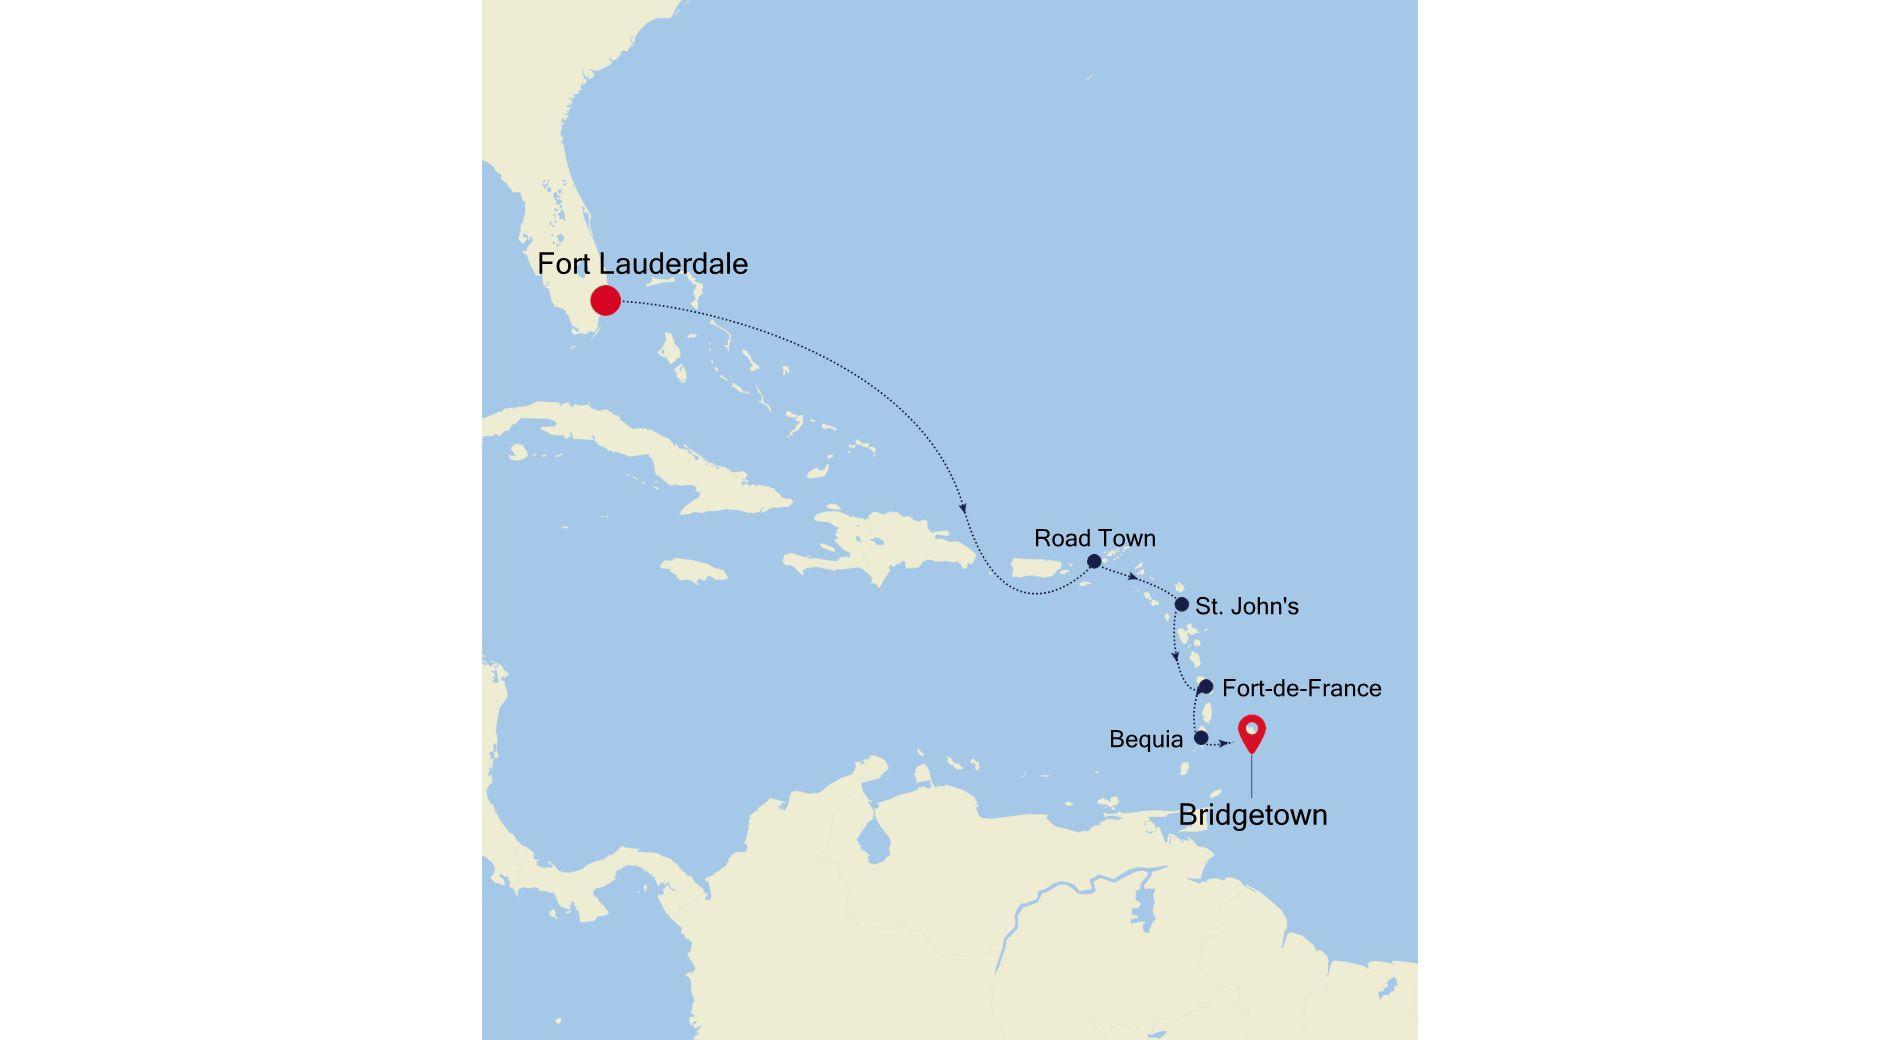 MO201223S07 - Fort Lauderdale a Bridgetown